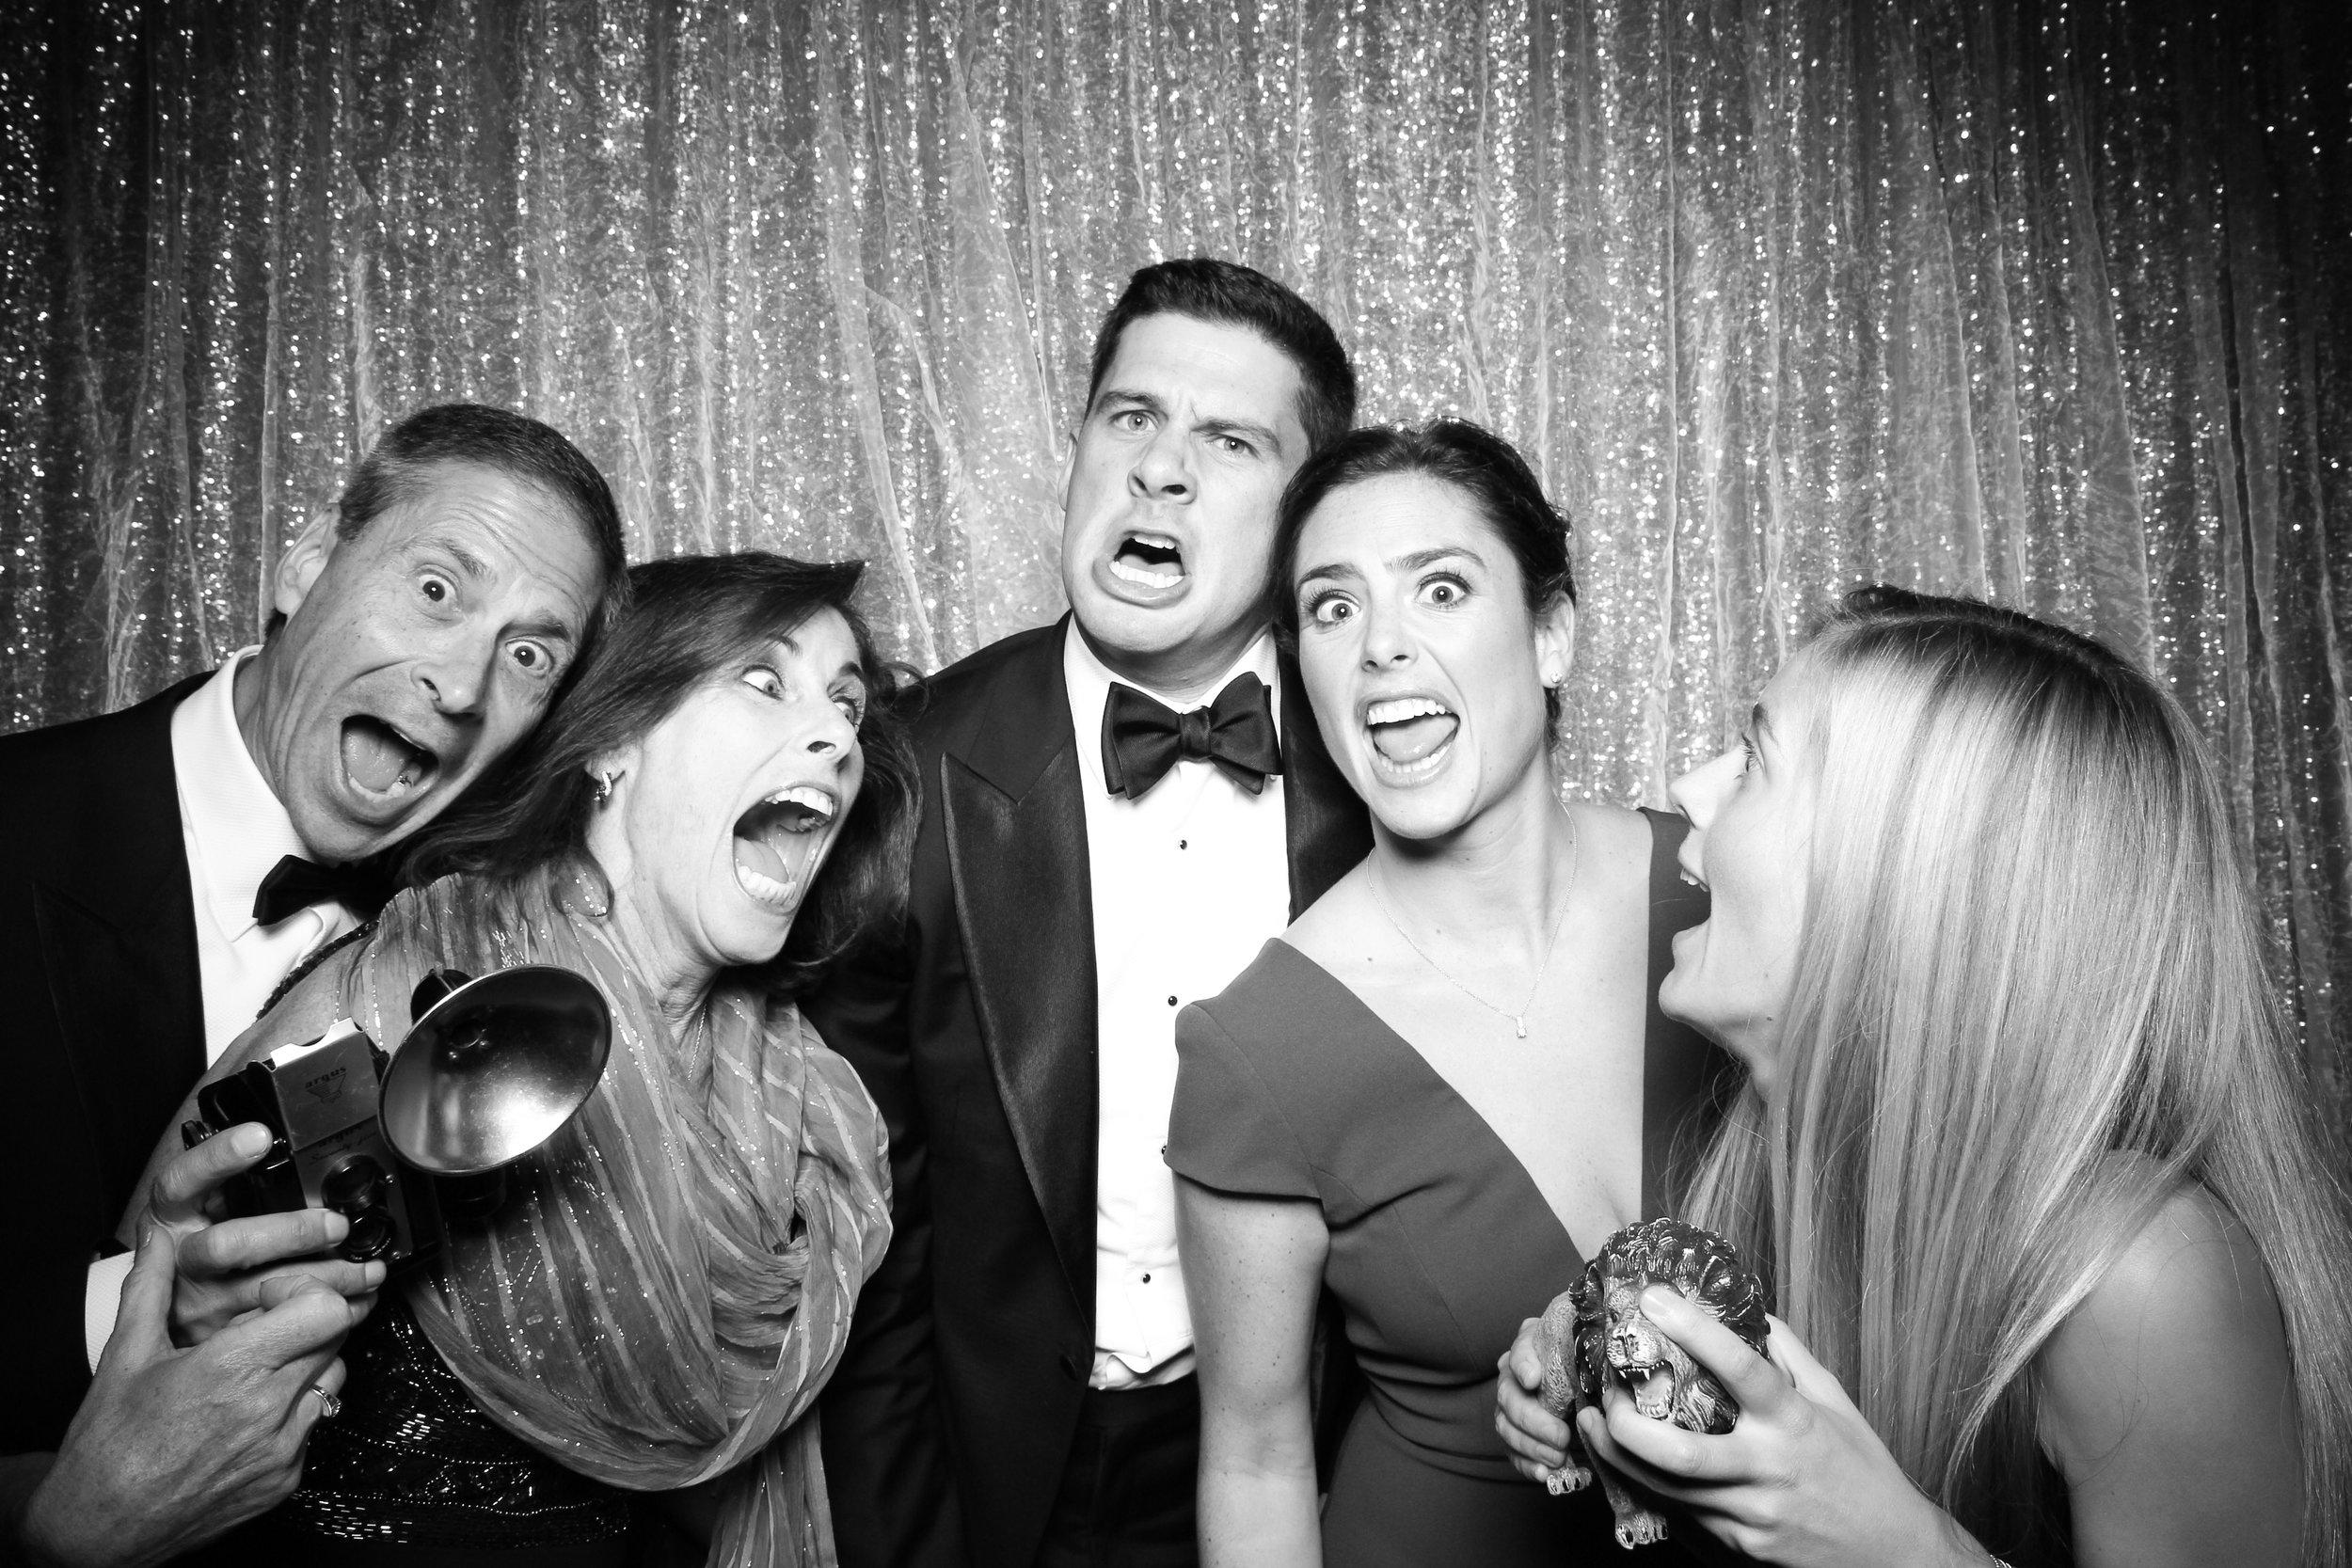 JW_Marriott_Burnham_Ballroom_Wedding_Photo_Booth_12.jpg